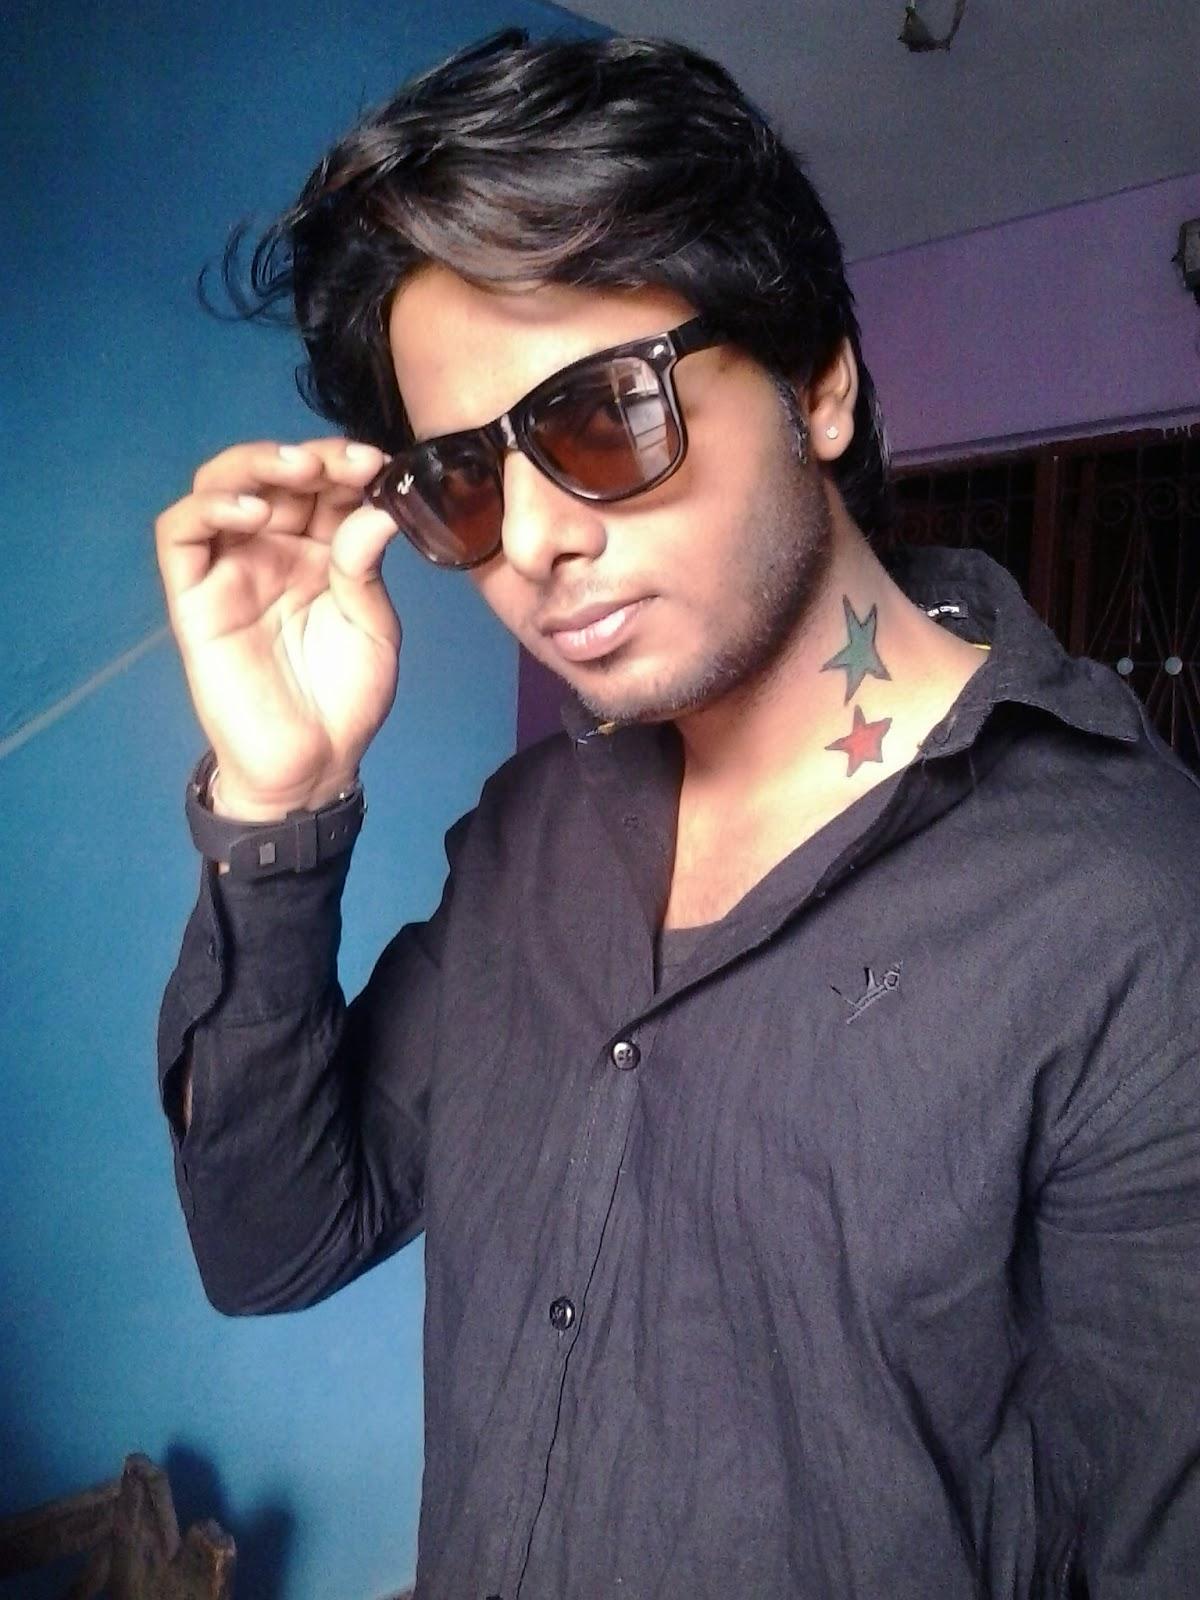 ravi kumar smart boy in delhi